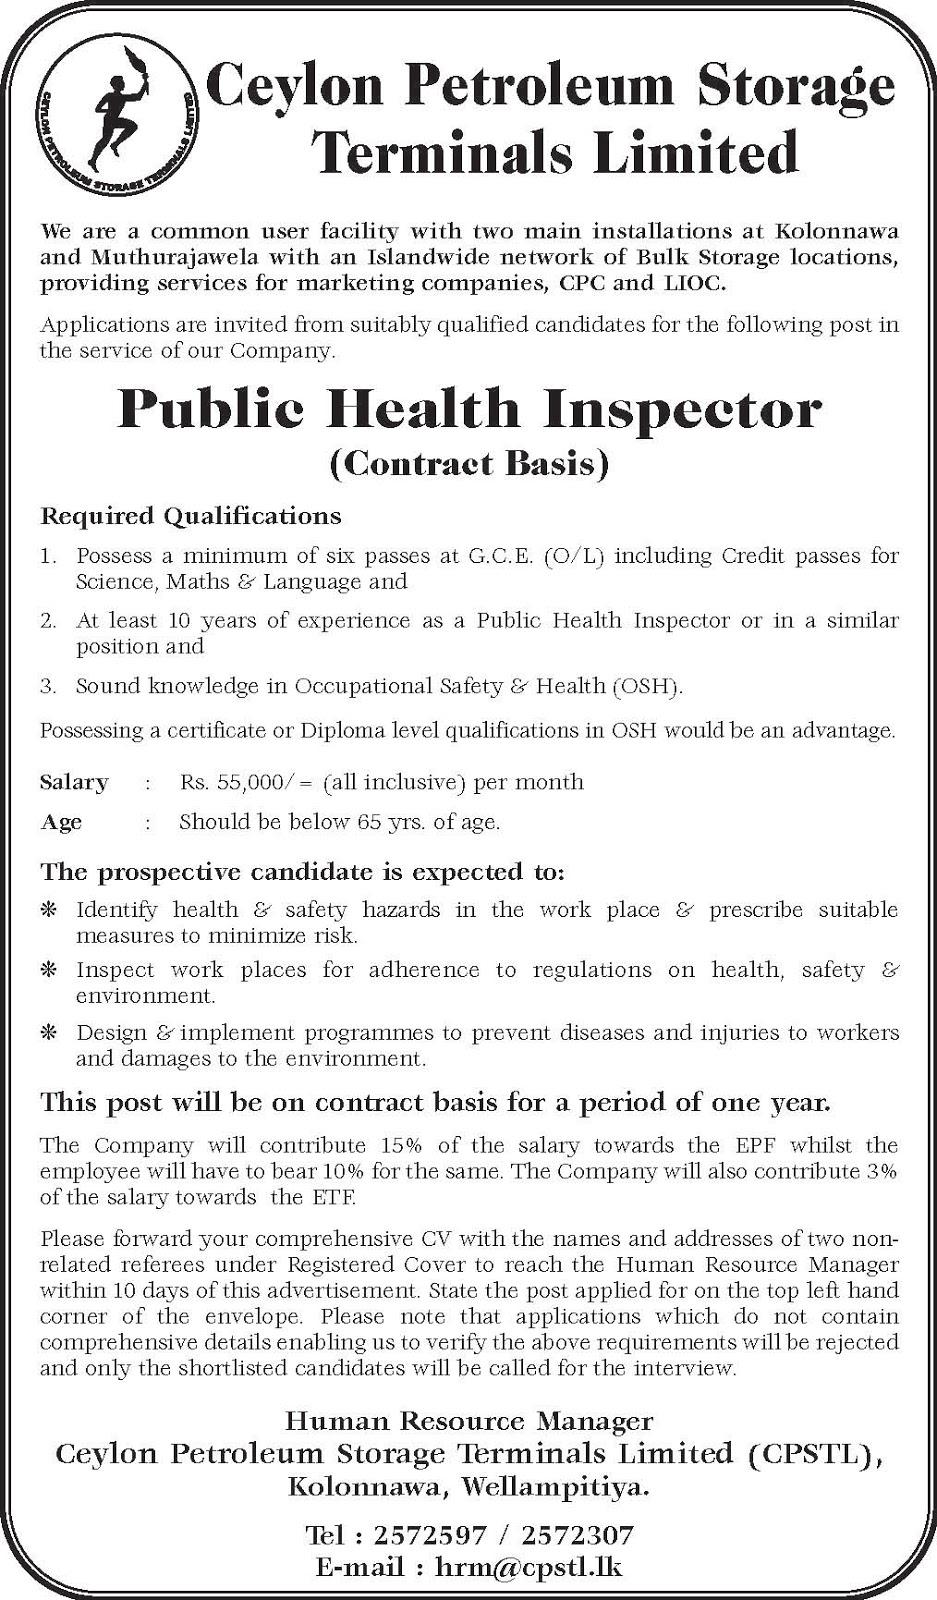 cv example for job service resume cv example for job it cv example information technology cv curriculum vitae job lanka vacancies